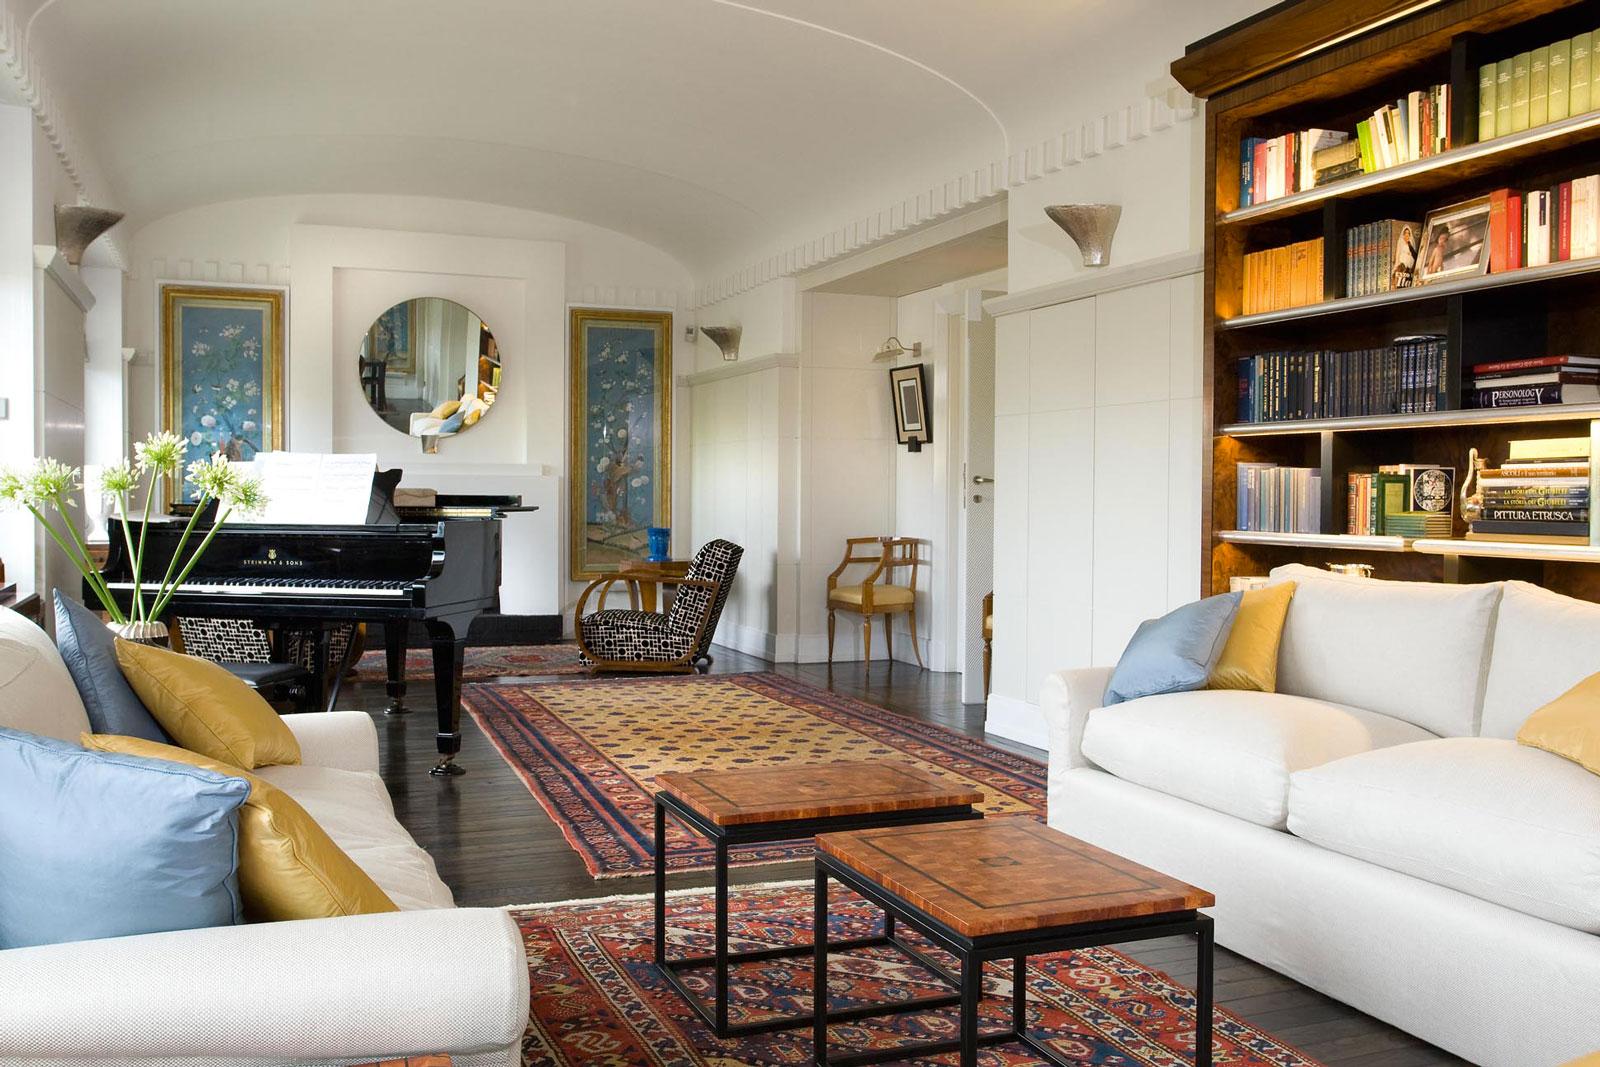 Come abbinare arredamento classico e moderno insieme for At casa arredamento